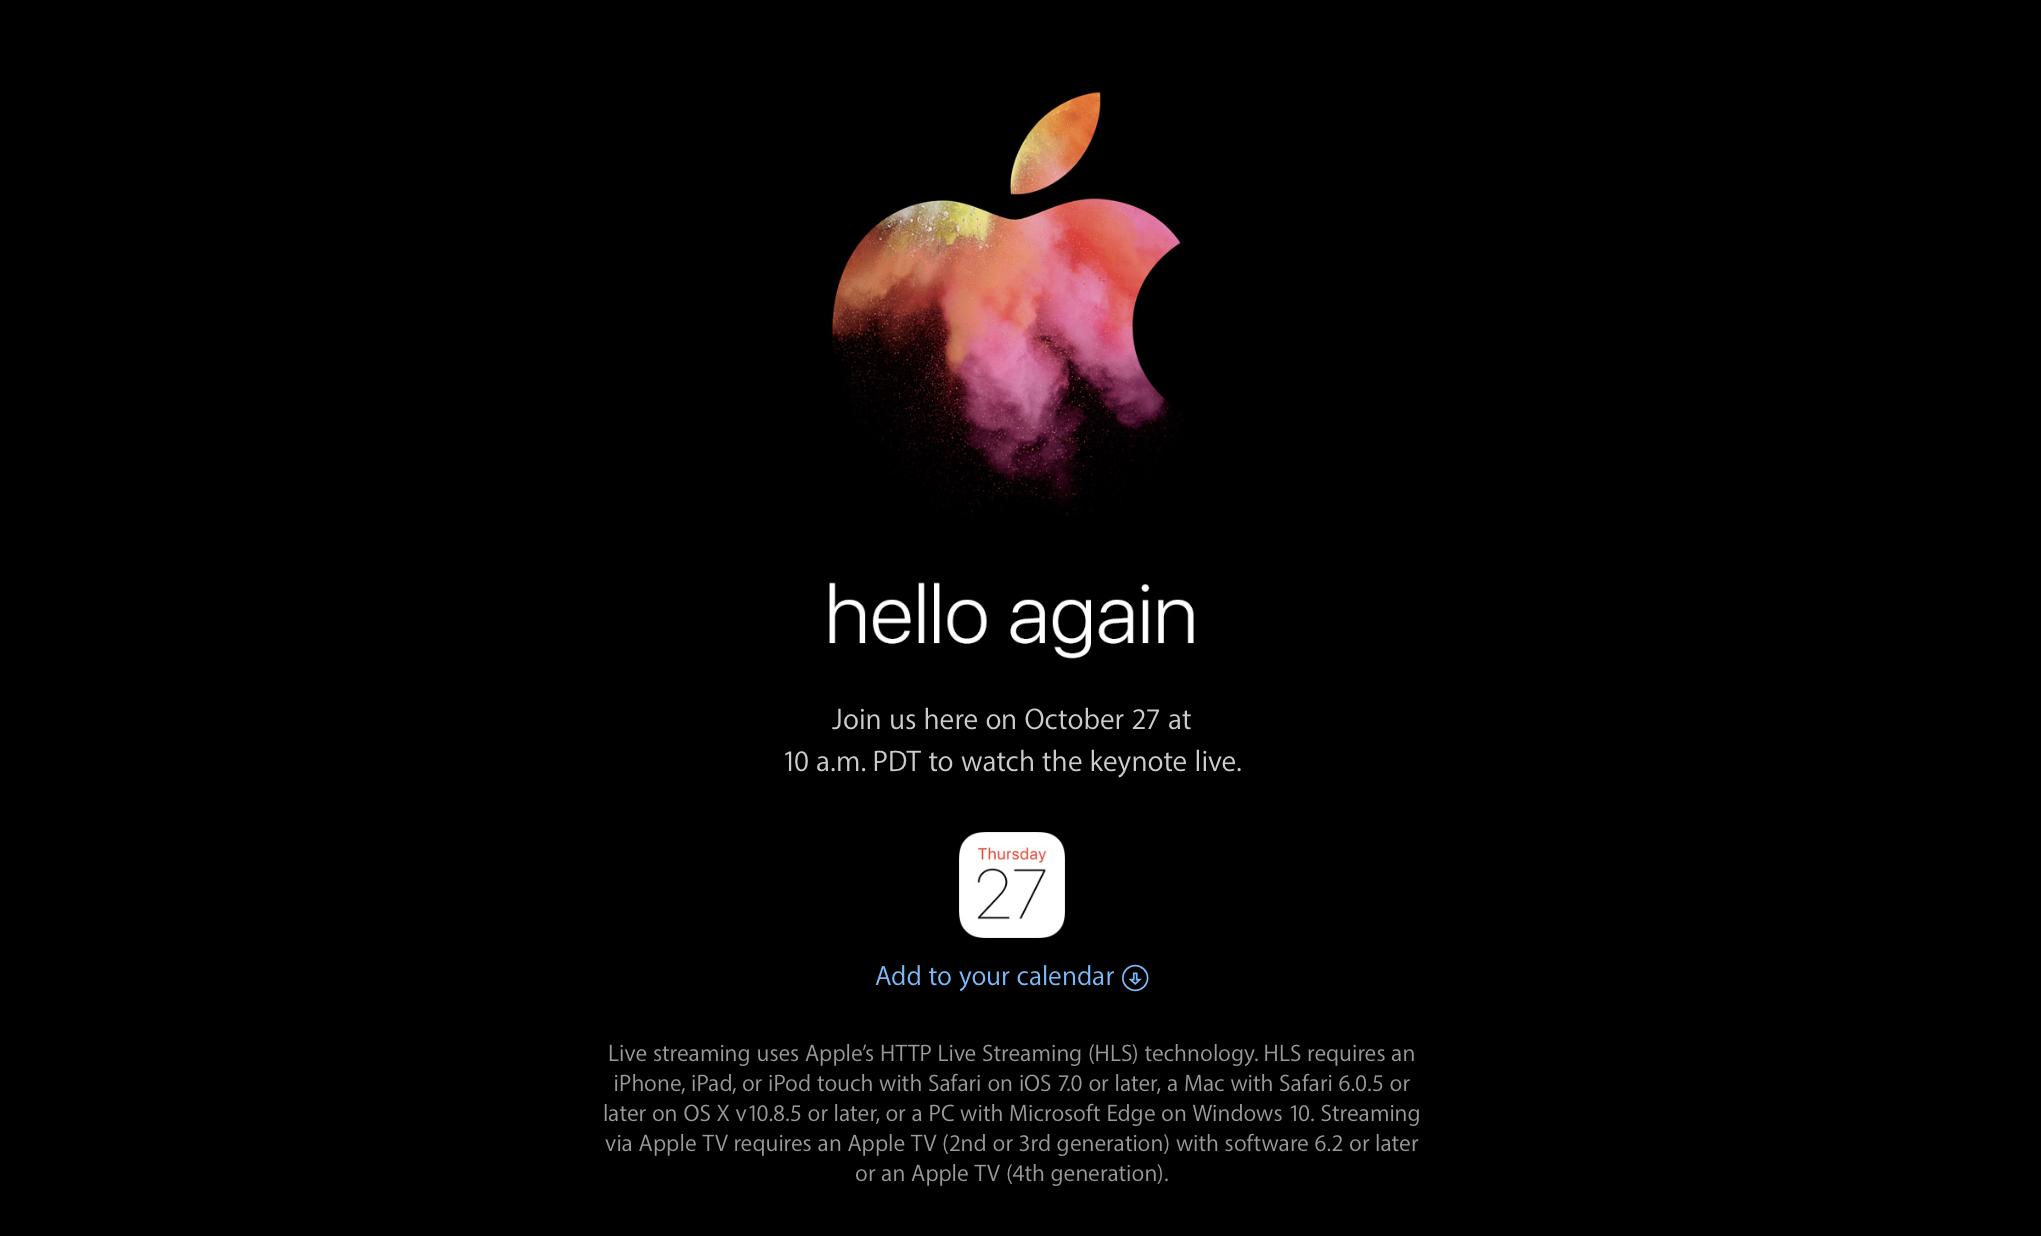 apple-event-hello-again